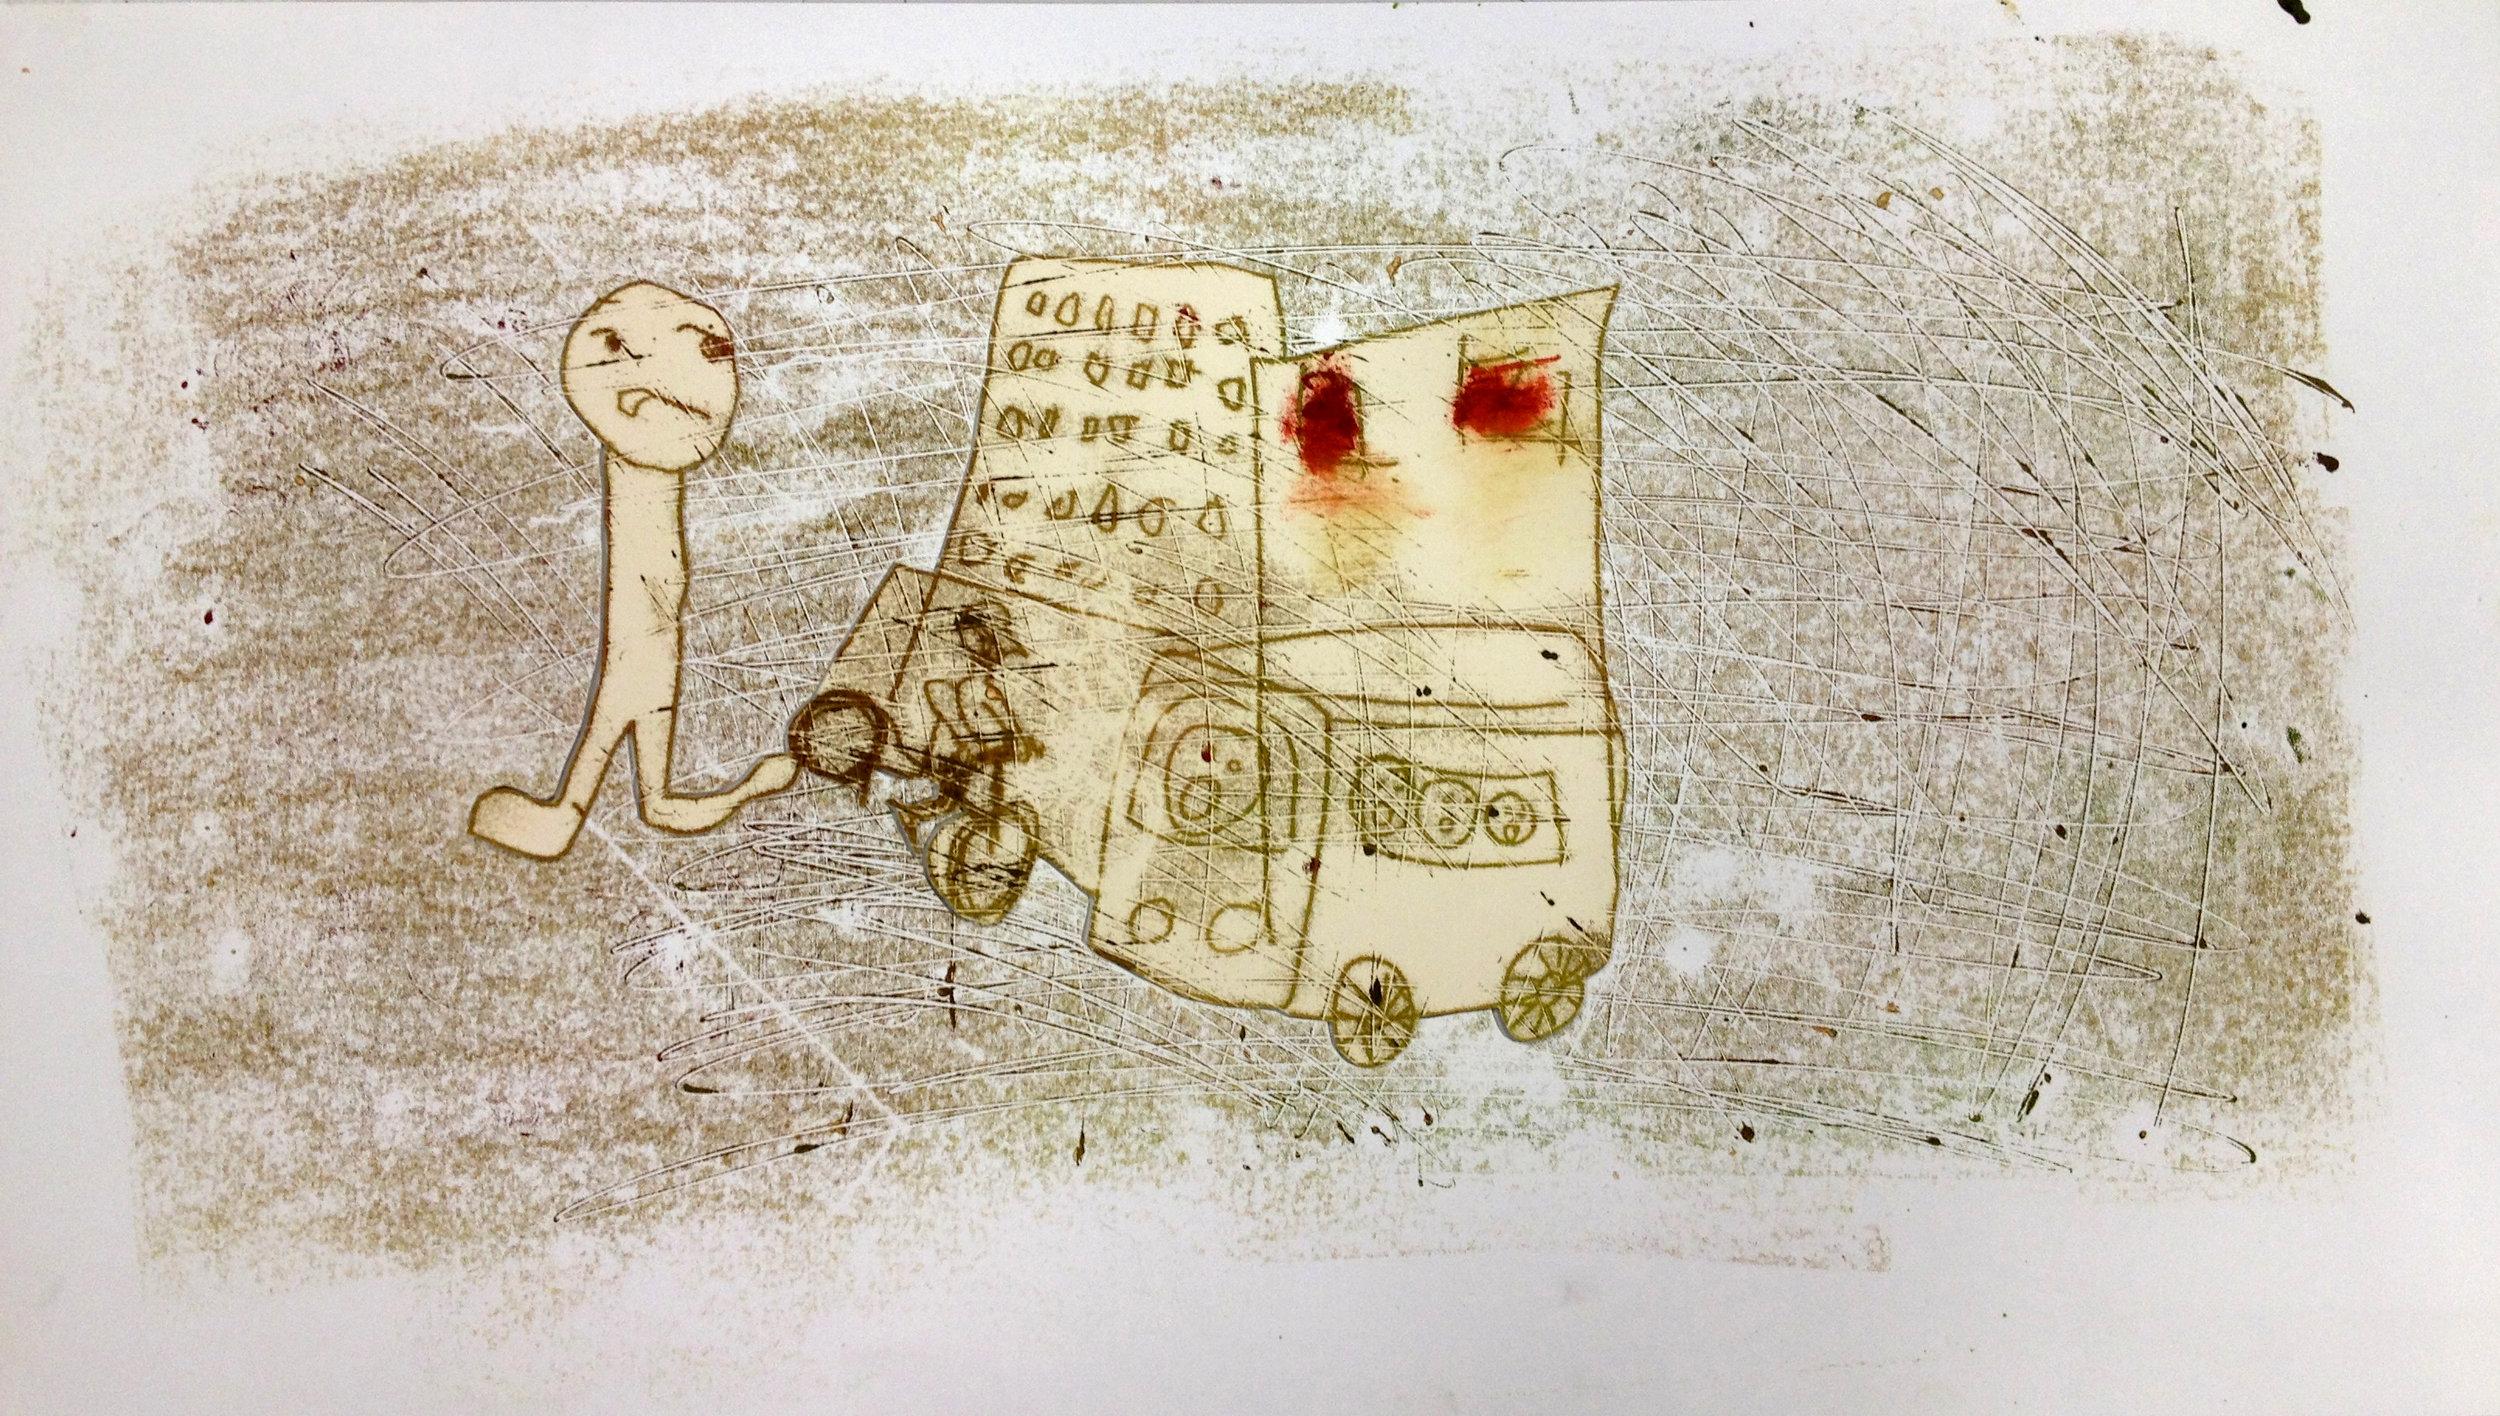 Bus Crash (collaboration with Ashley Carrega), 2013, trace monotype